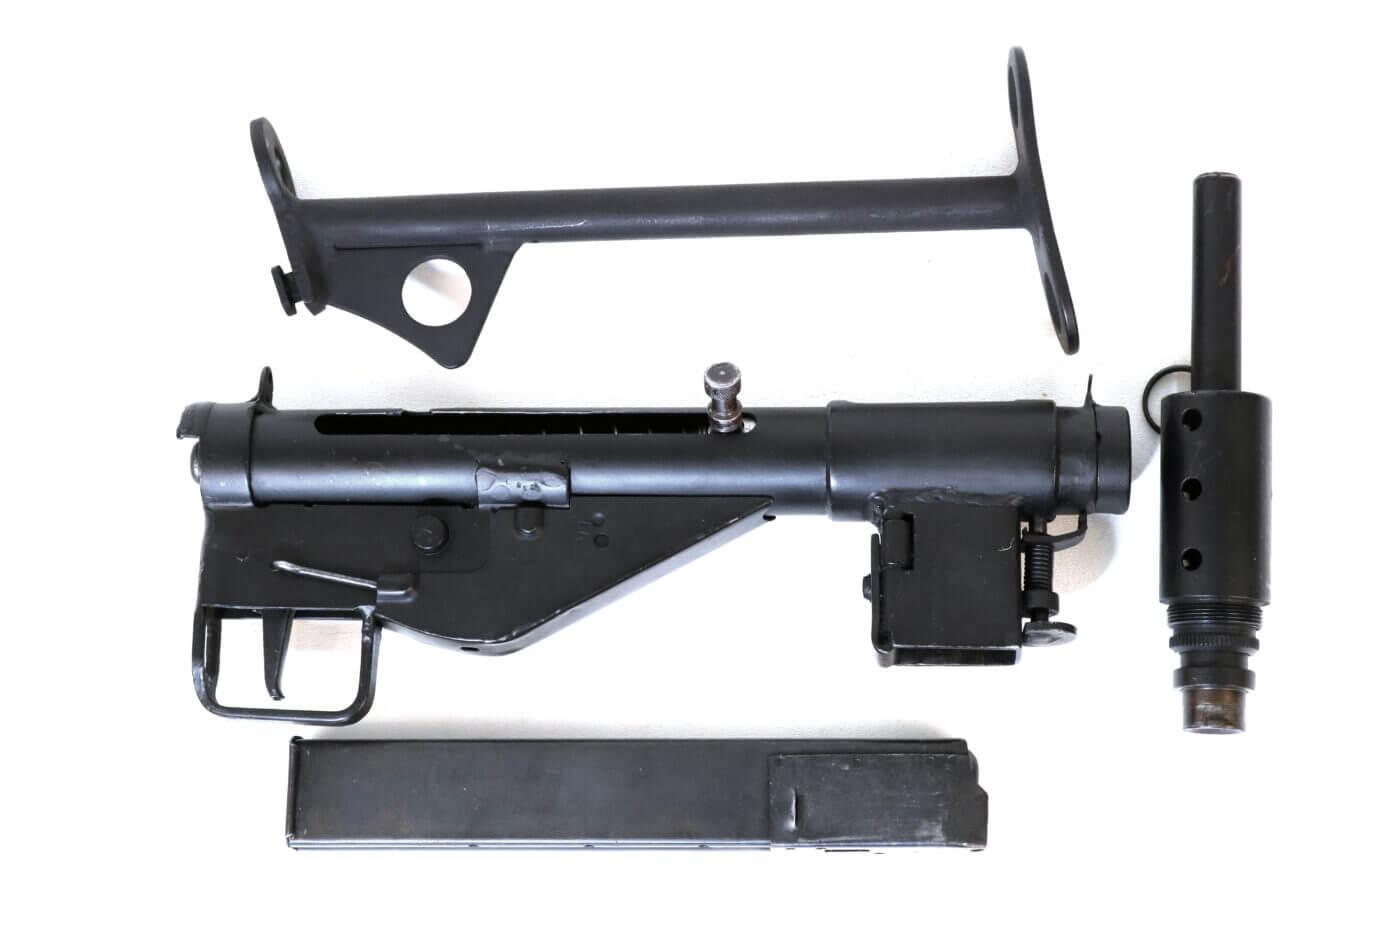 Field stripped Sten gun